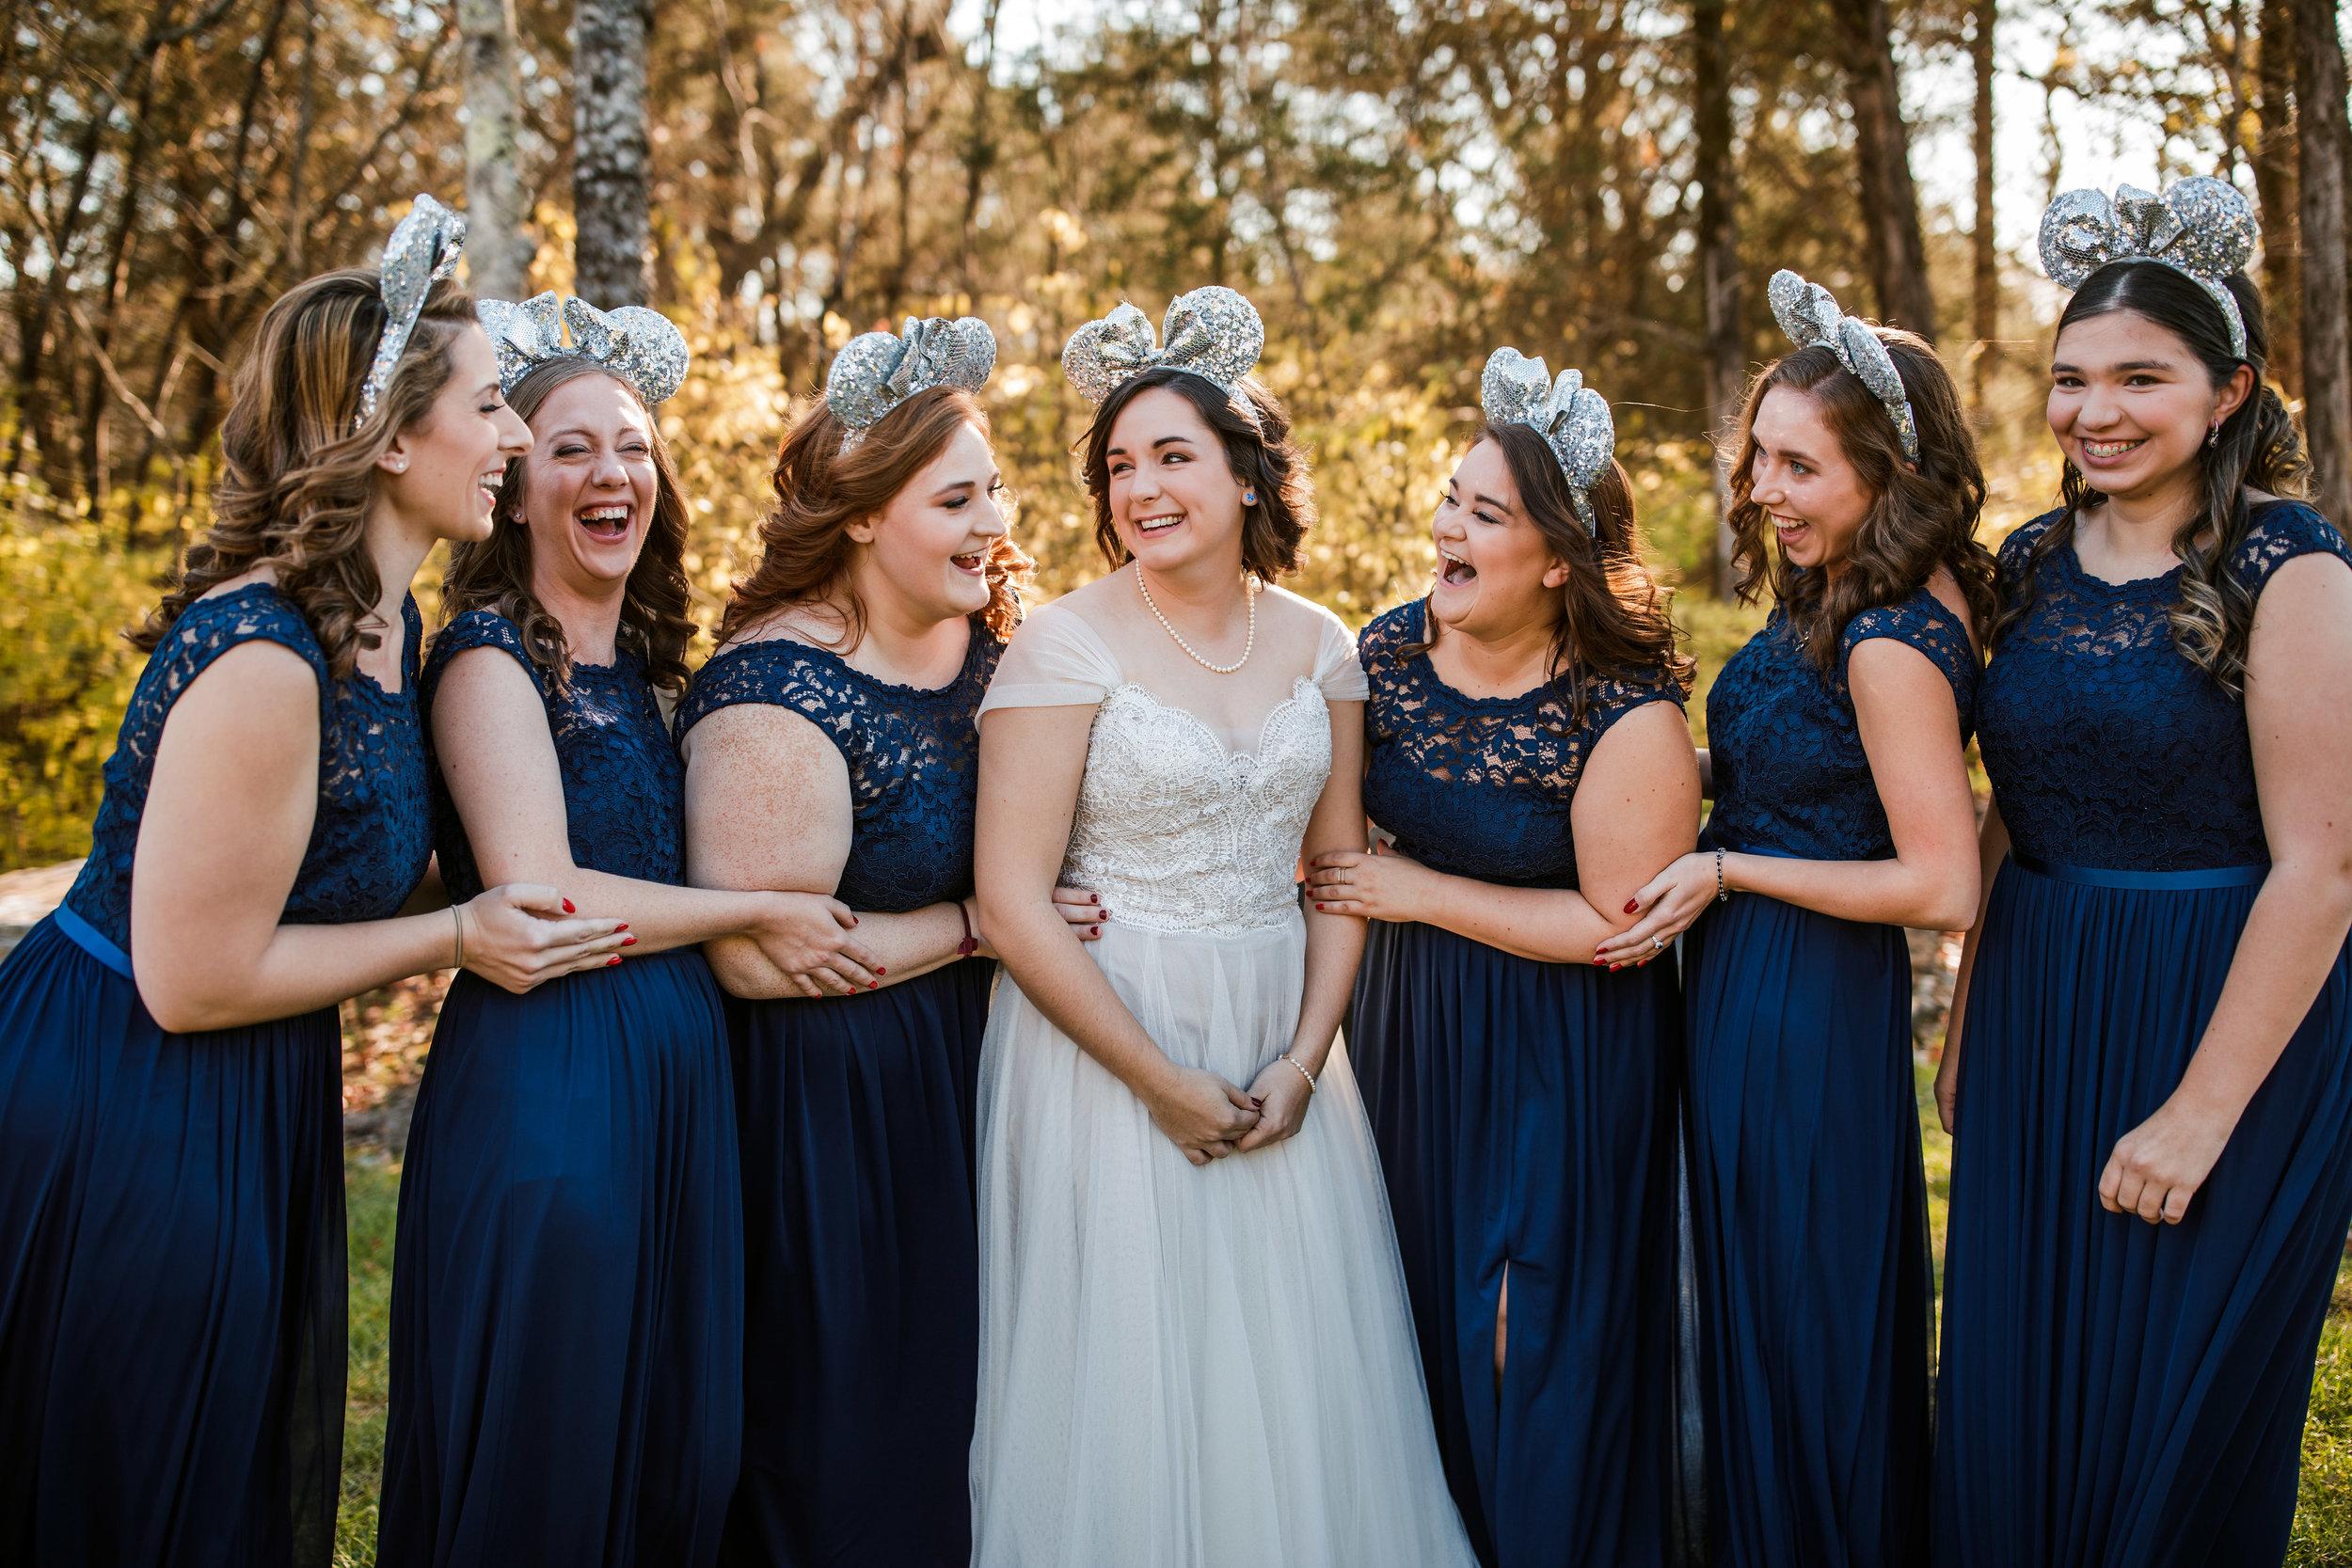 Graystone-Quarry-Wedding 18.jpg